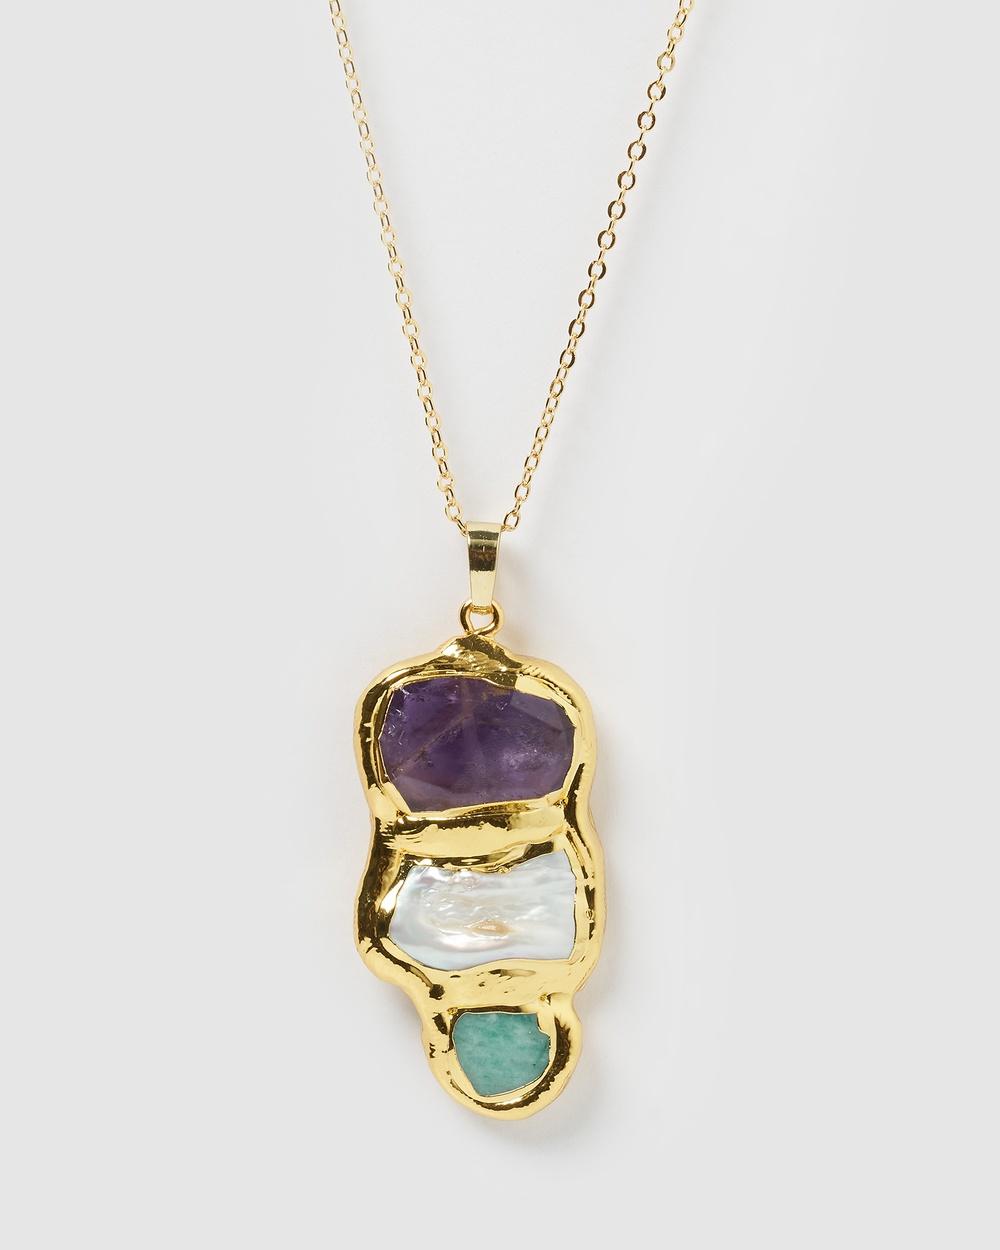 Miz Casa and Co Monti Necklace Jewellery Gold